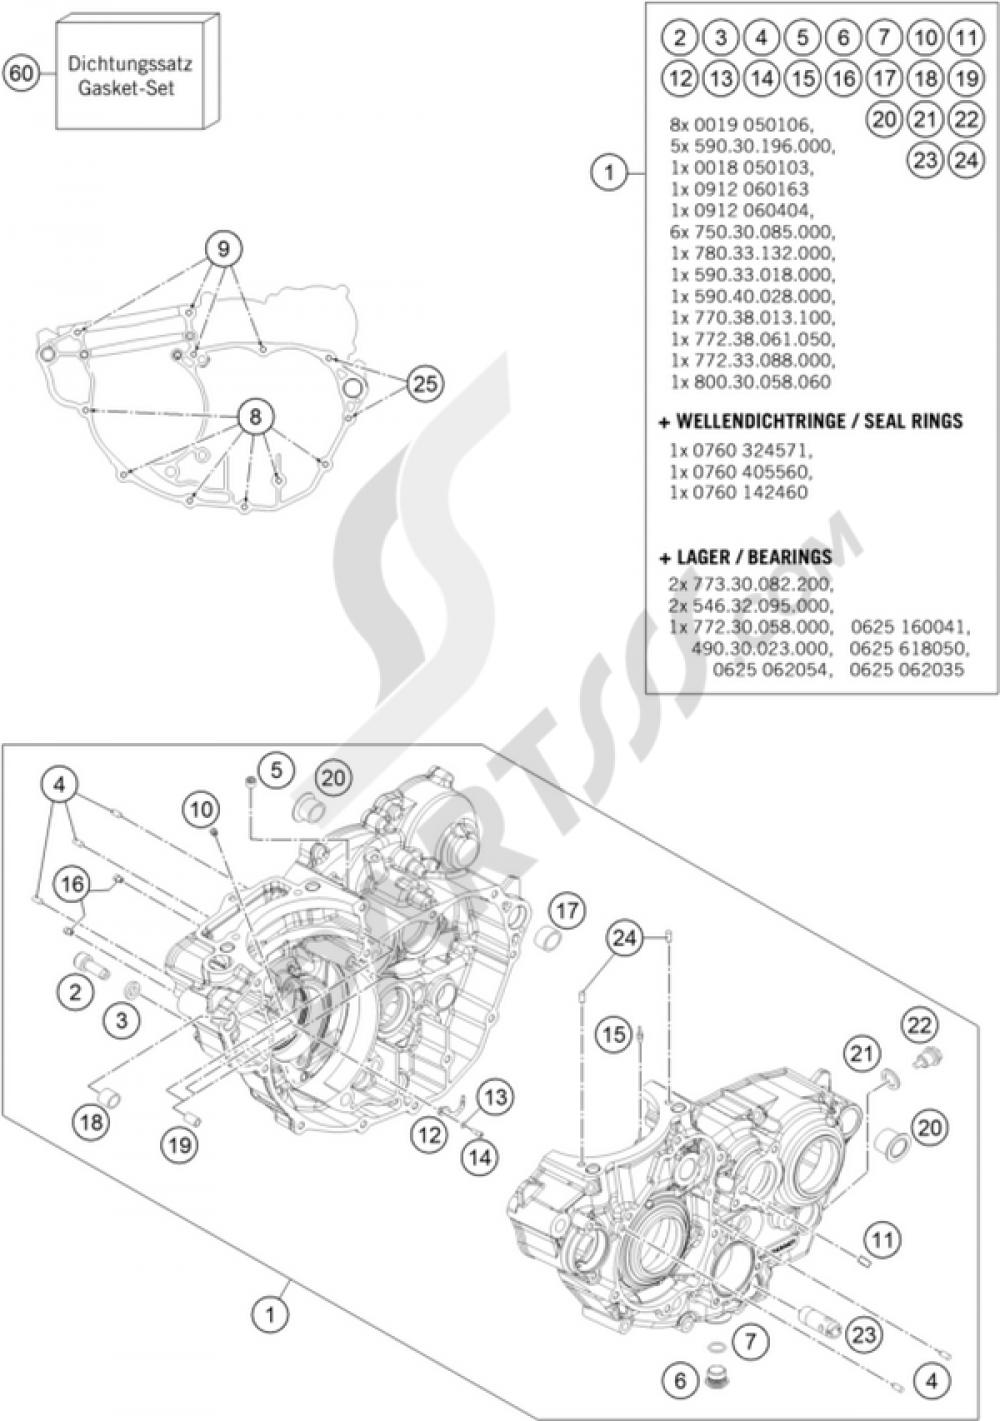 ktm-motorcycle350-exc-f-engine-case_1000 png